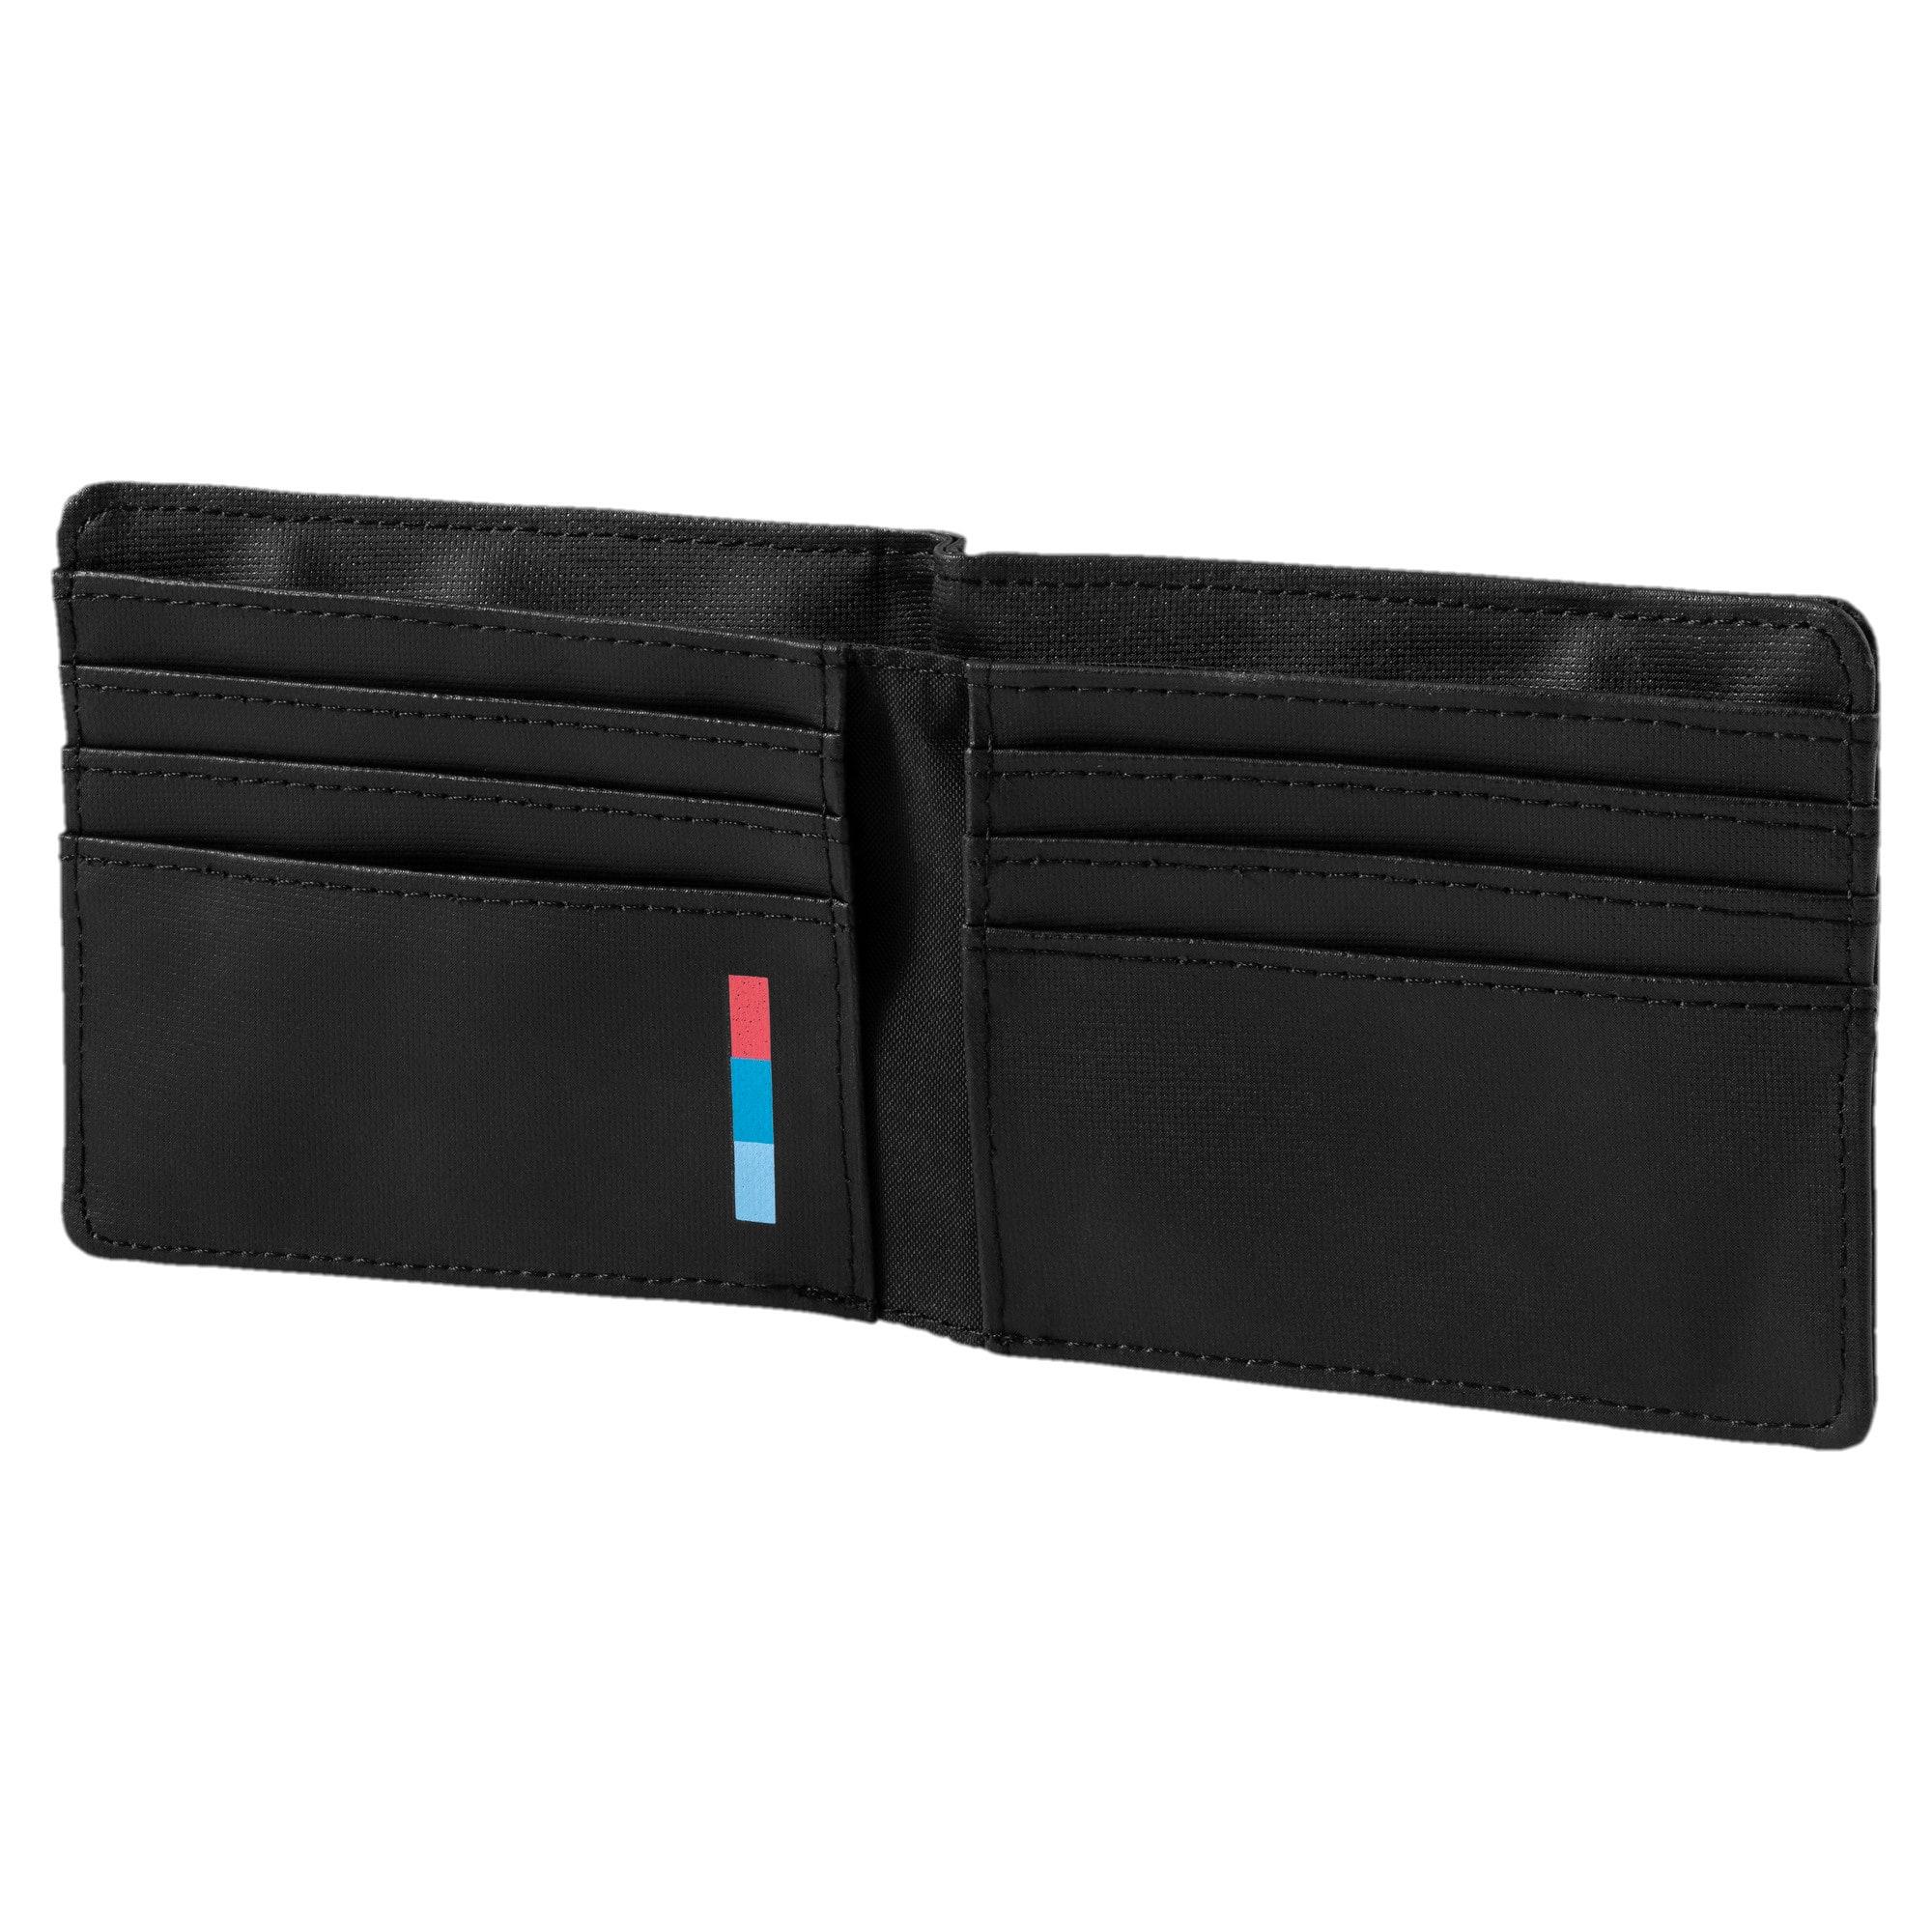 Thumbnail 3 of BMW Motorsport Wallet, Puma Black, medium-IND